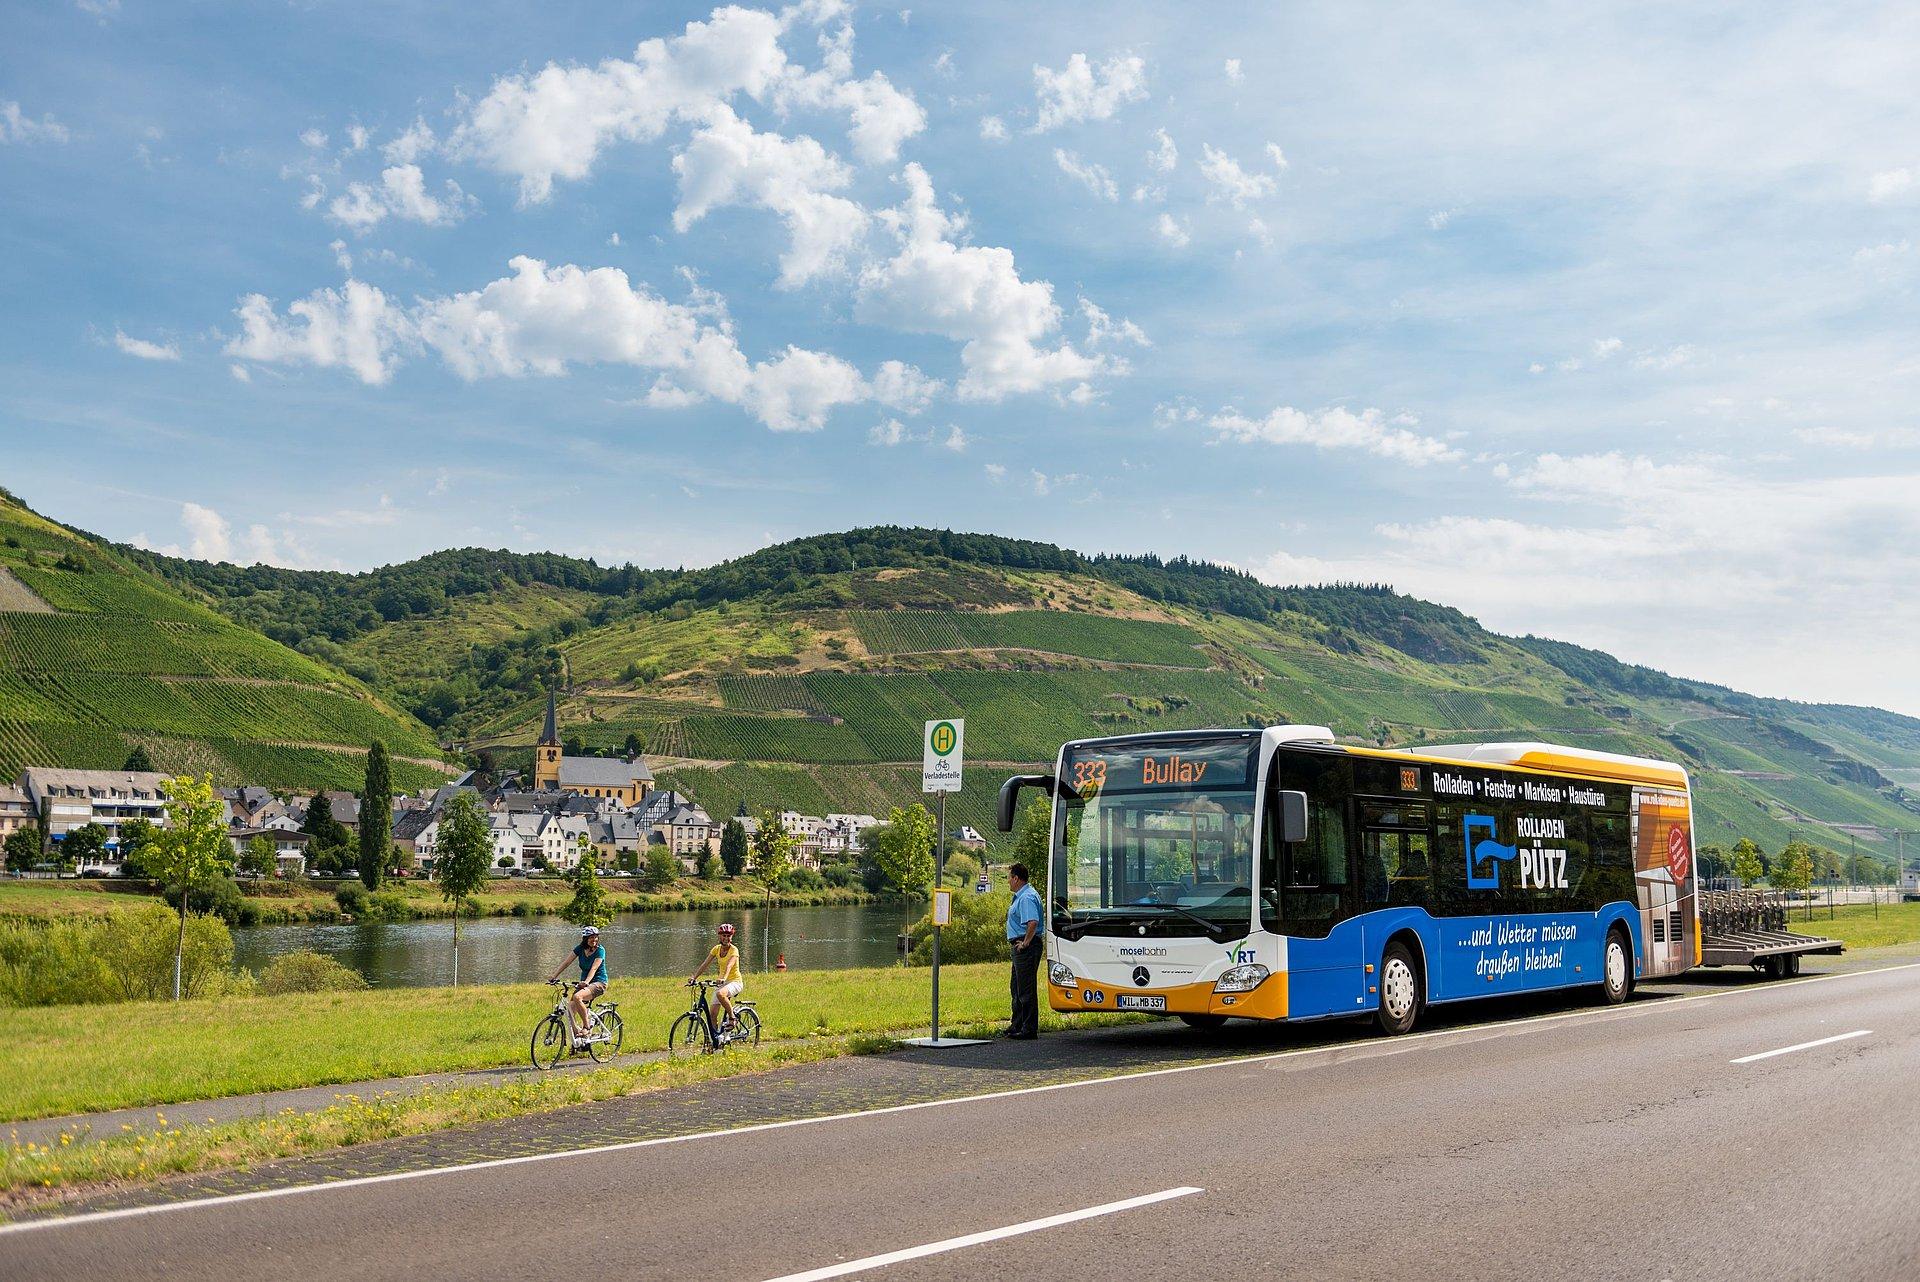 RadBus am Moselradweg bei Zeltingen-Rachtig, Mosel